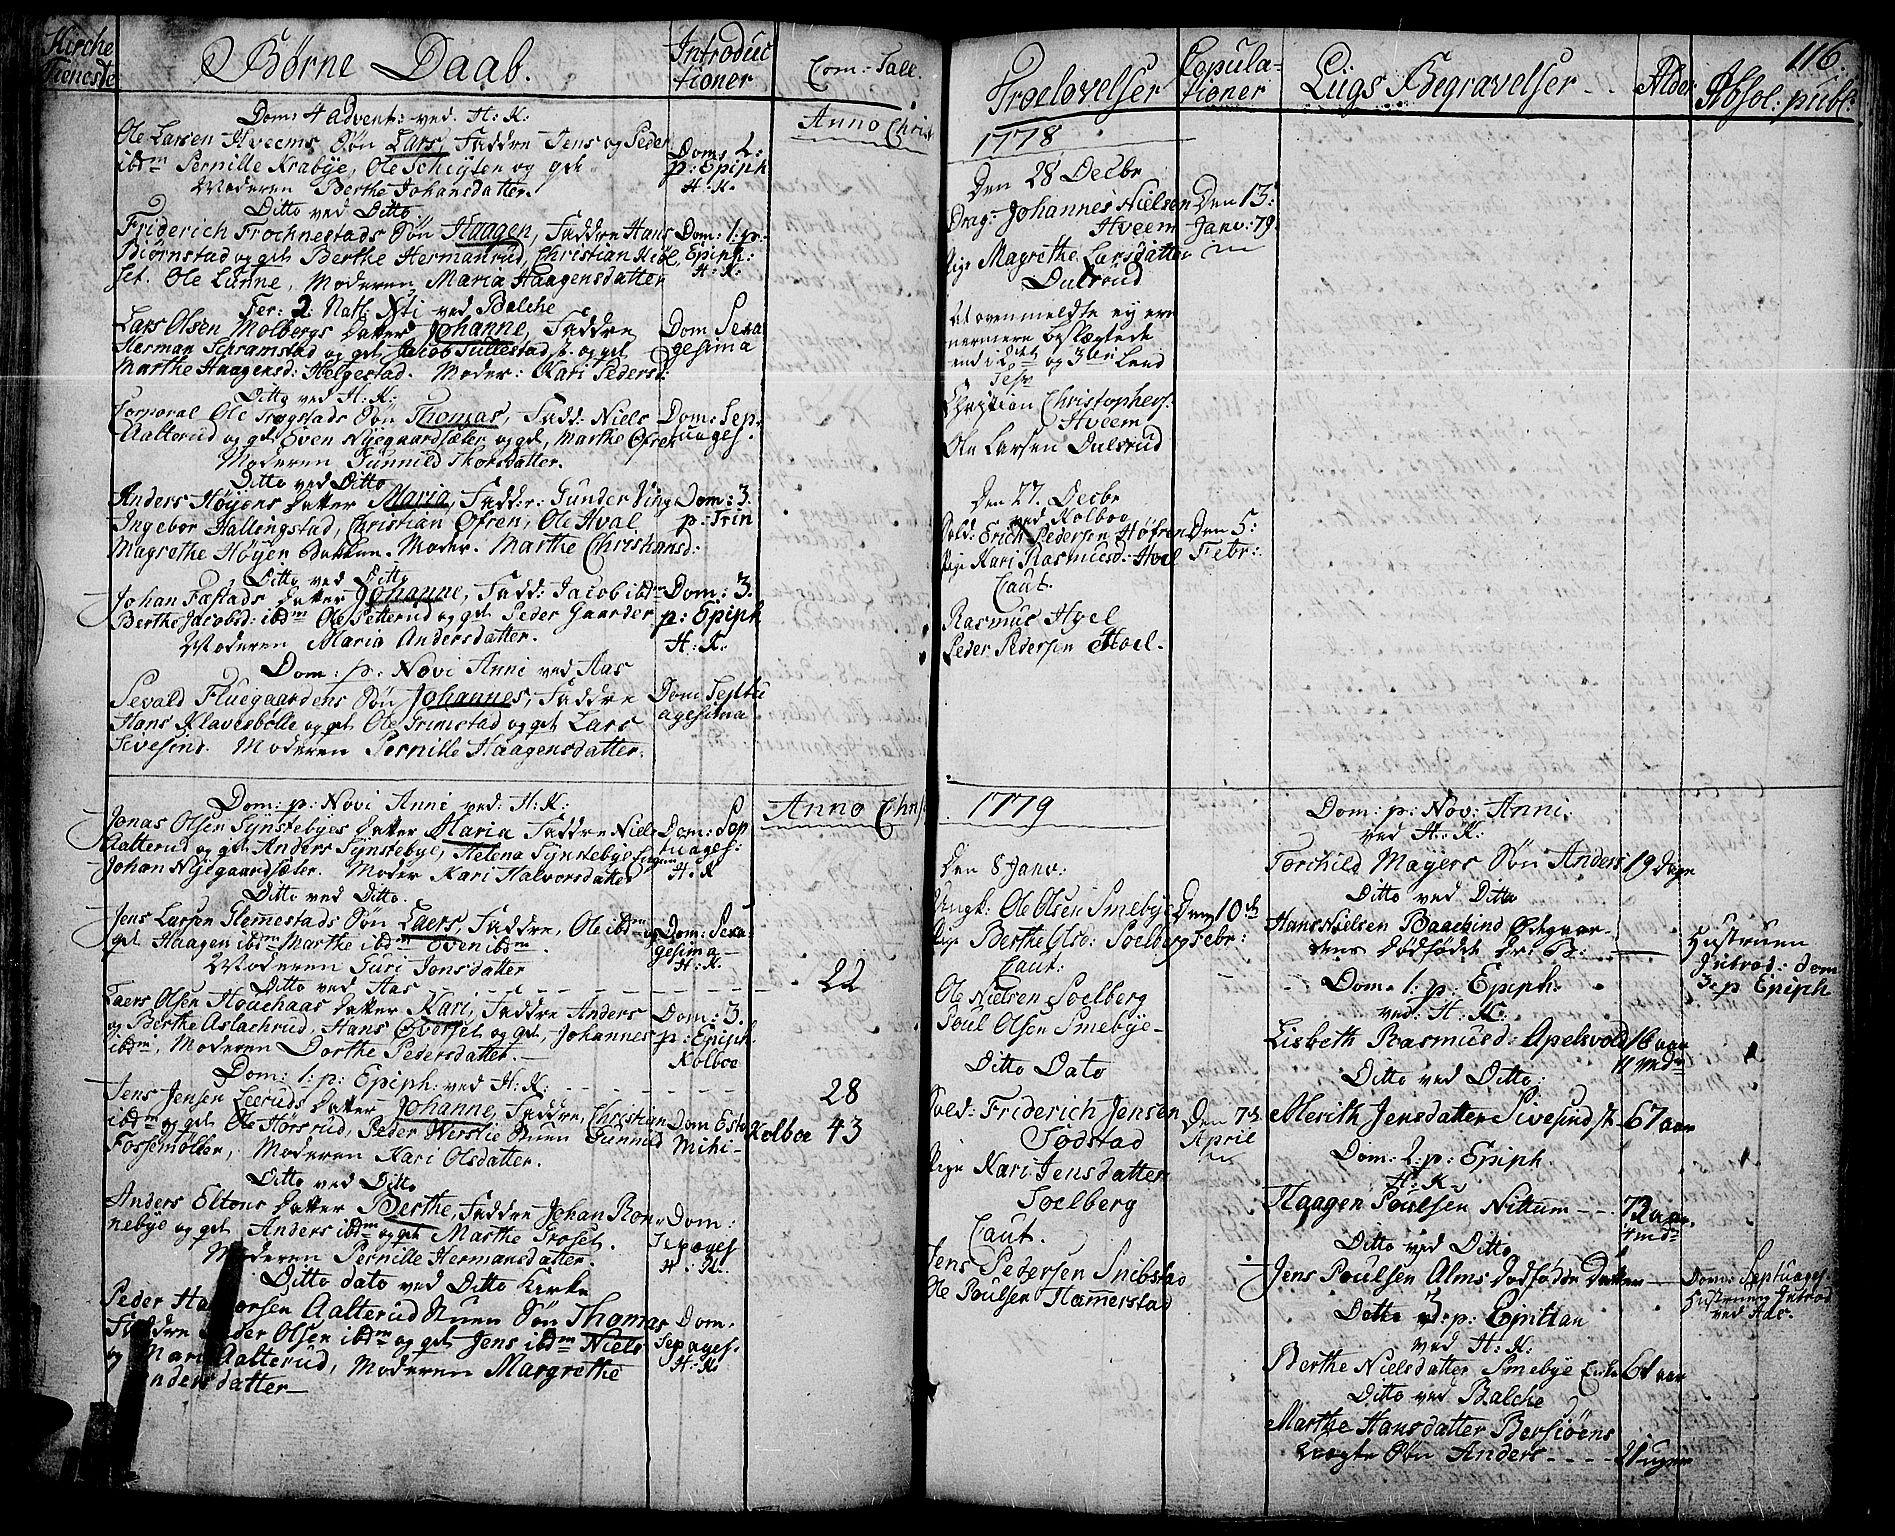 SAH, Toten prestekontor, Ministerialbok nr. 6, 1773-1793, s. 116